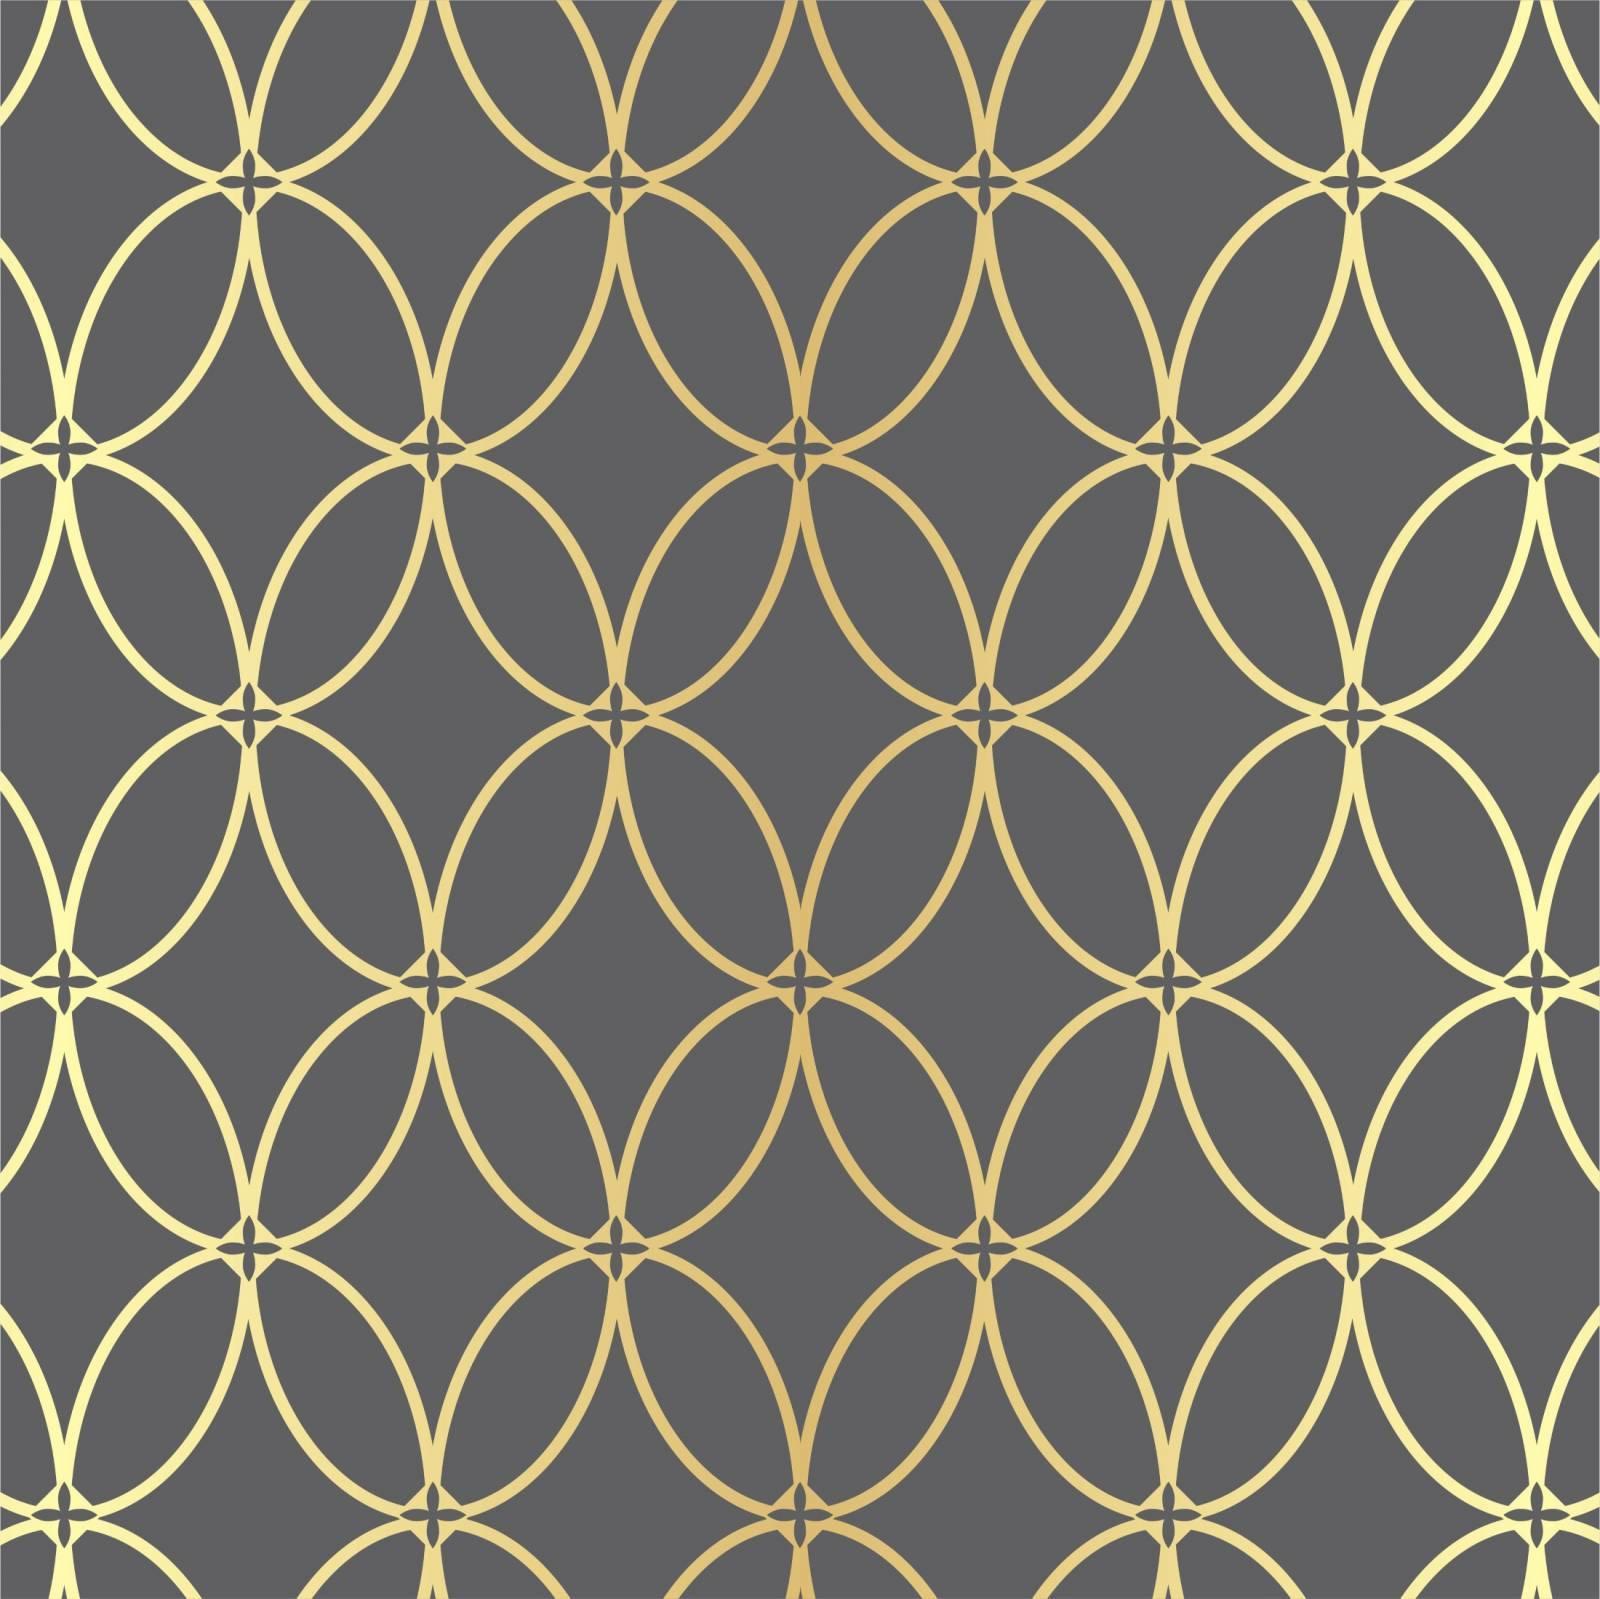 Adesivo De Parede Geométrico ~ Papel de Parede Adesivo Geometrico Redecorei